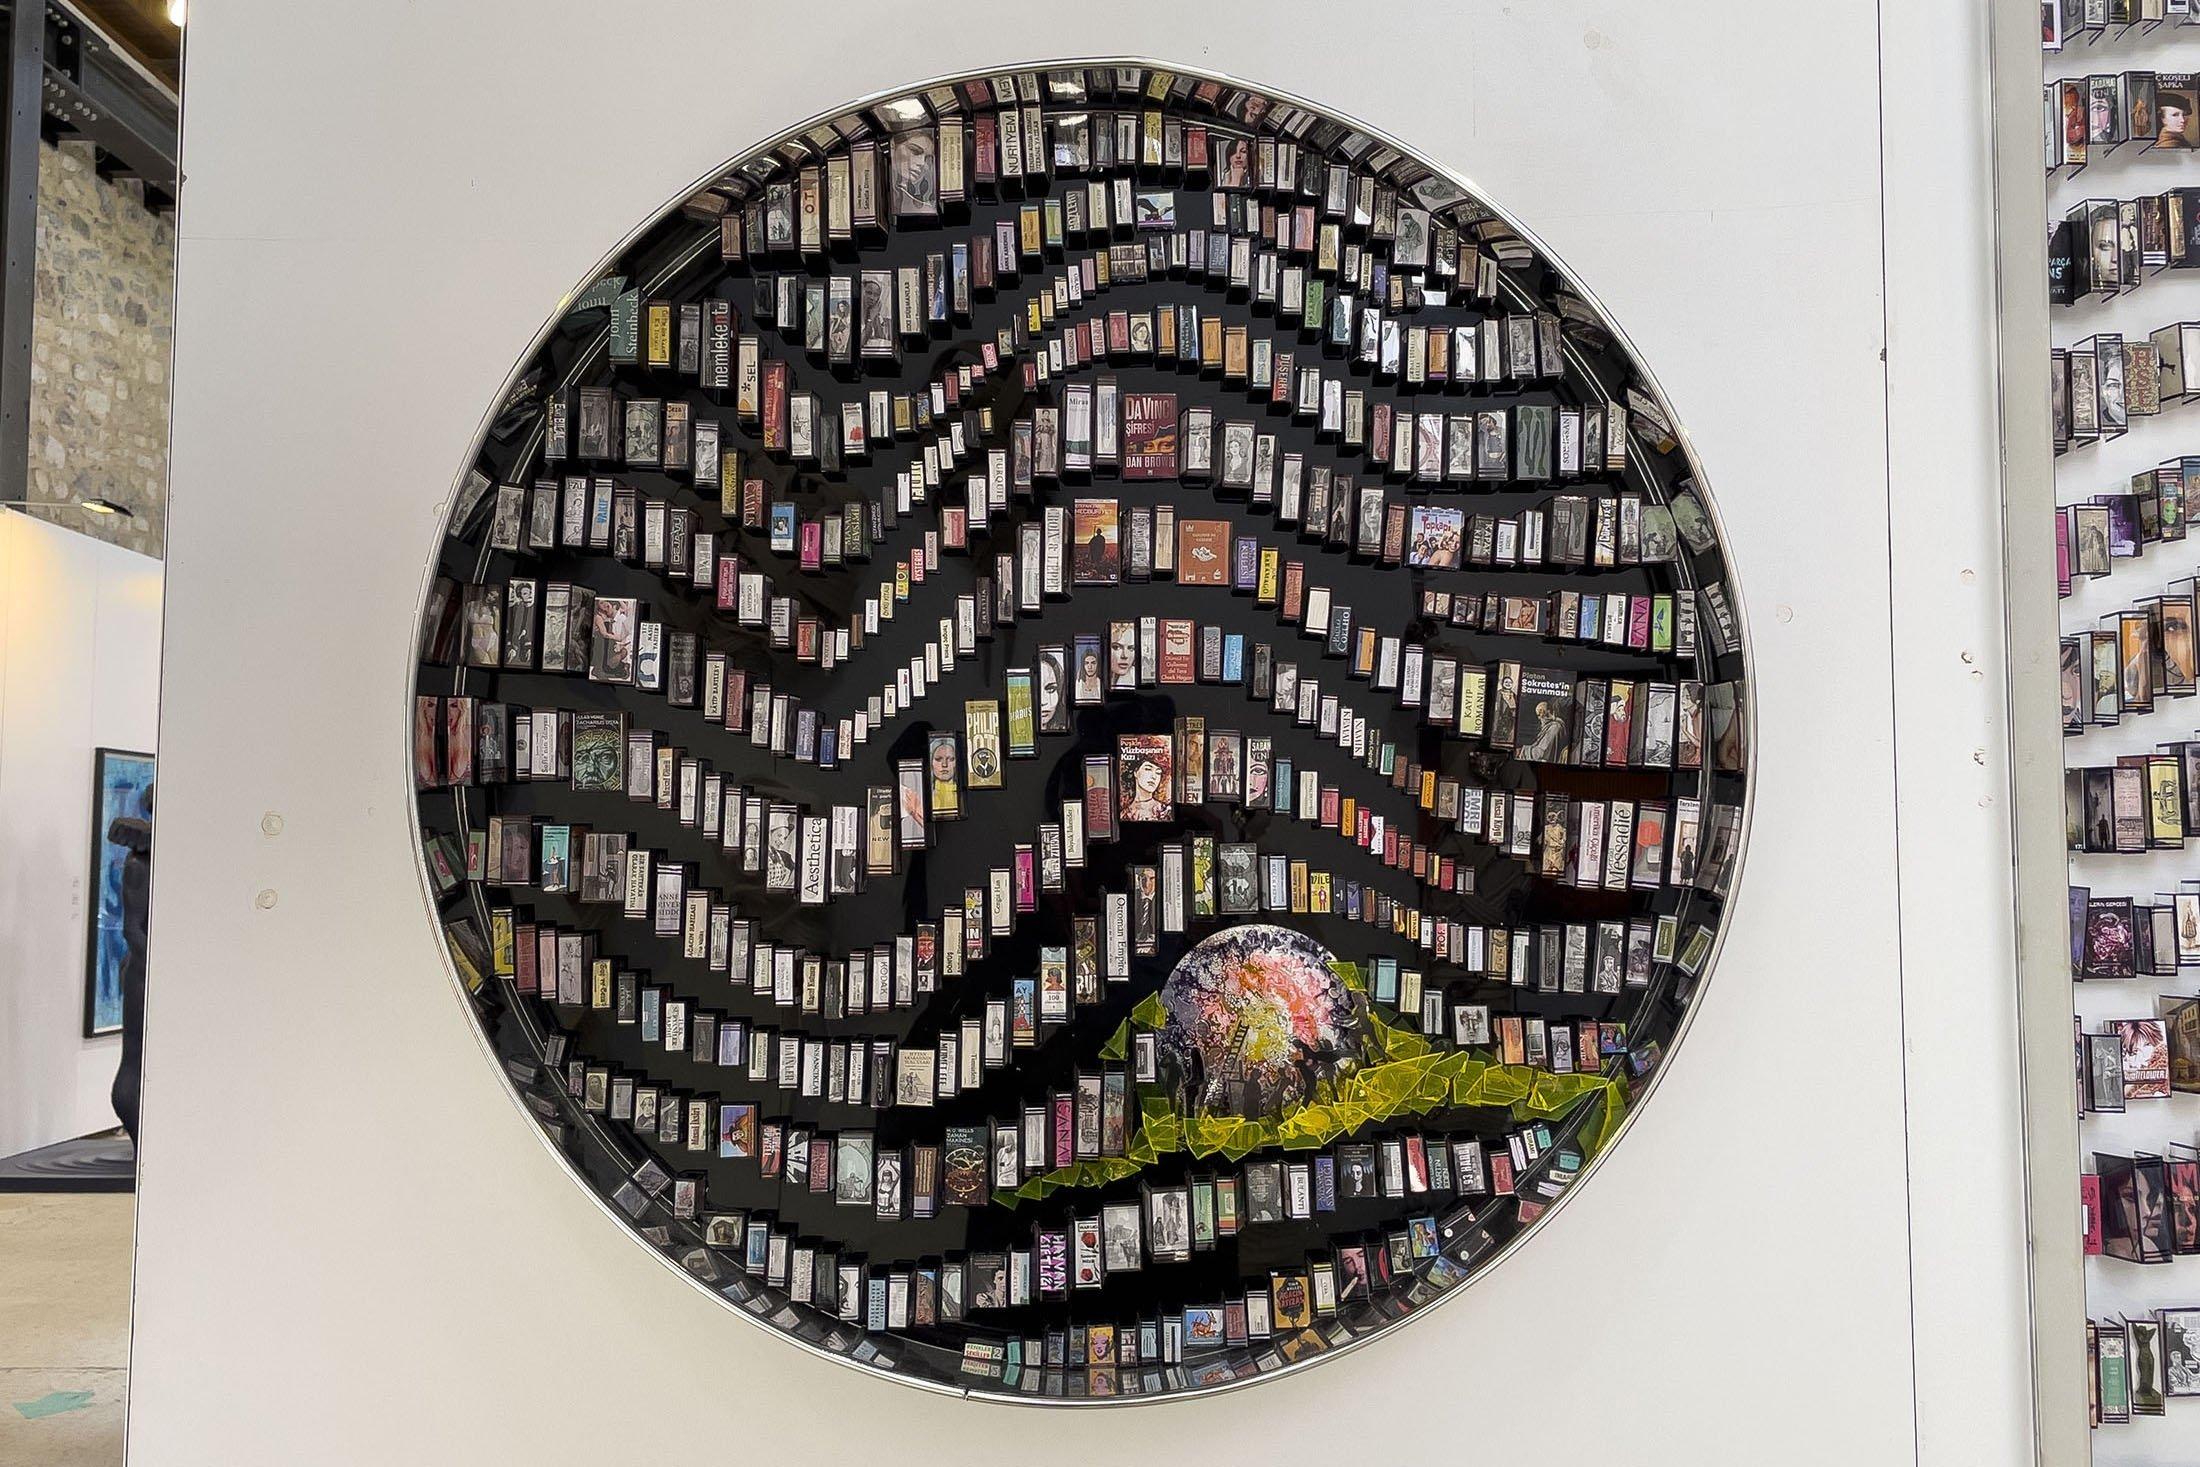 Engin Beyaz, 'Virtual Library,' 2021, mixed media plexiglass acetate, 73 by 73 by 5 centimeters. (Photo by Ahmet Koçak)